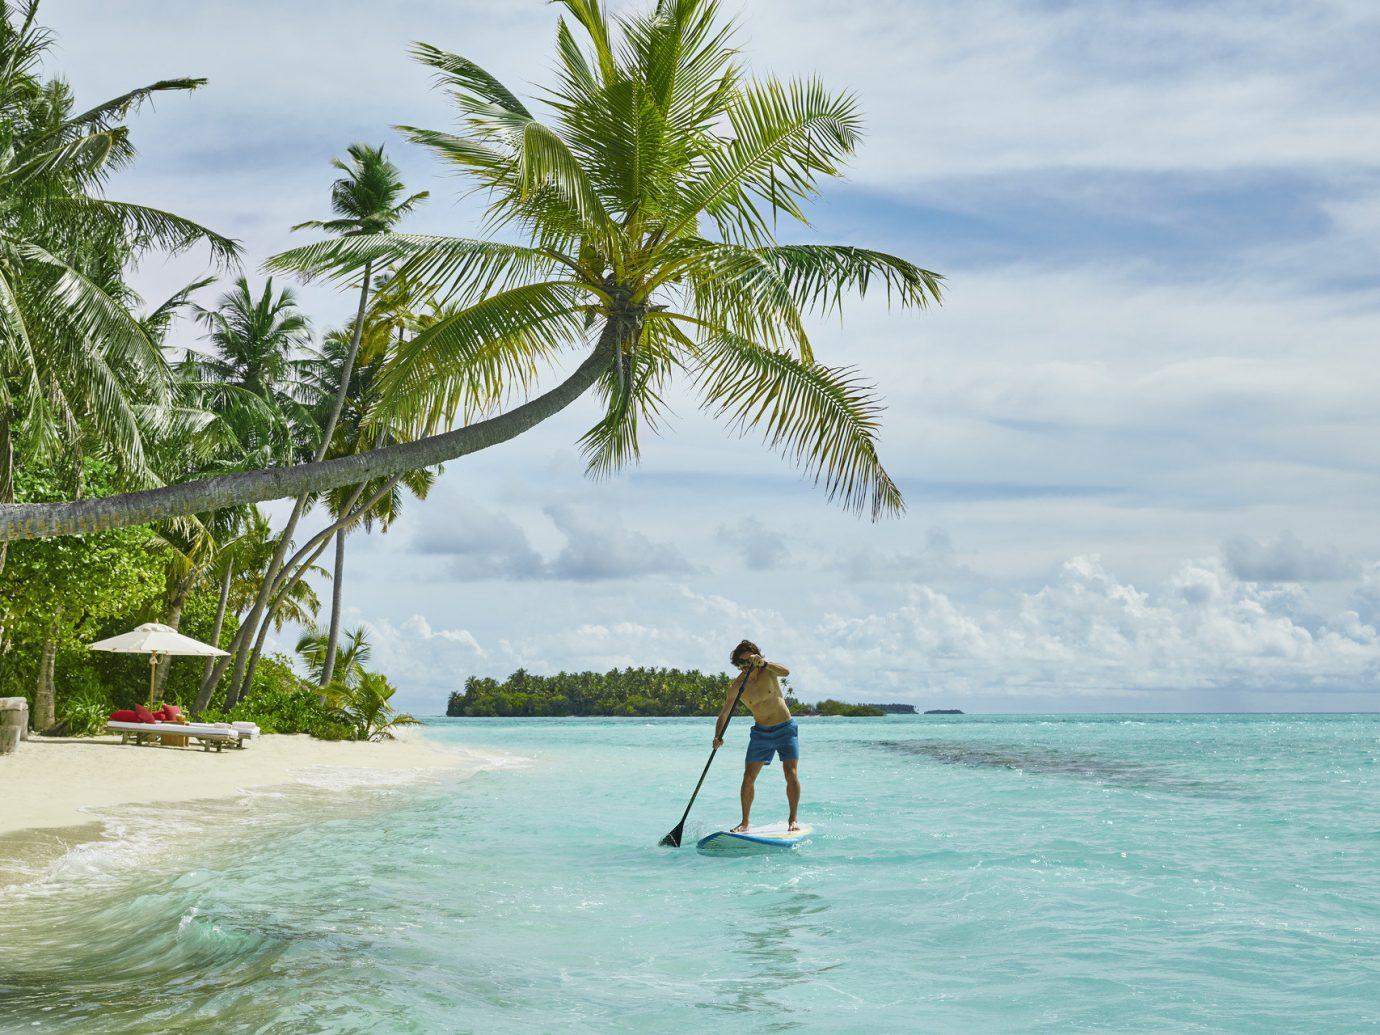 Budget water tree outdoor sky Beach body of water vacation Sea caribbean Ocean arecales tropics Coast Lagoon Island bay wave palm plant shore